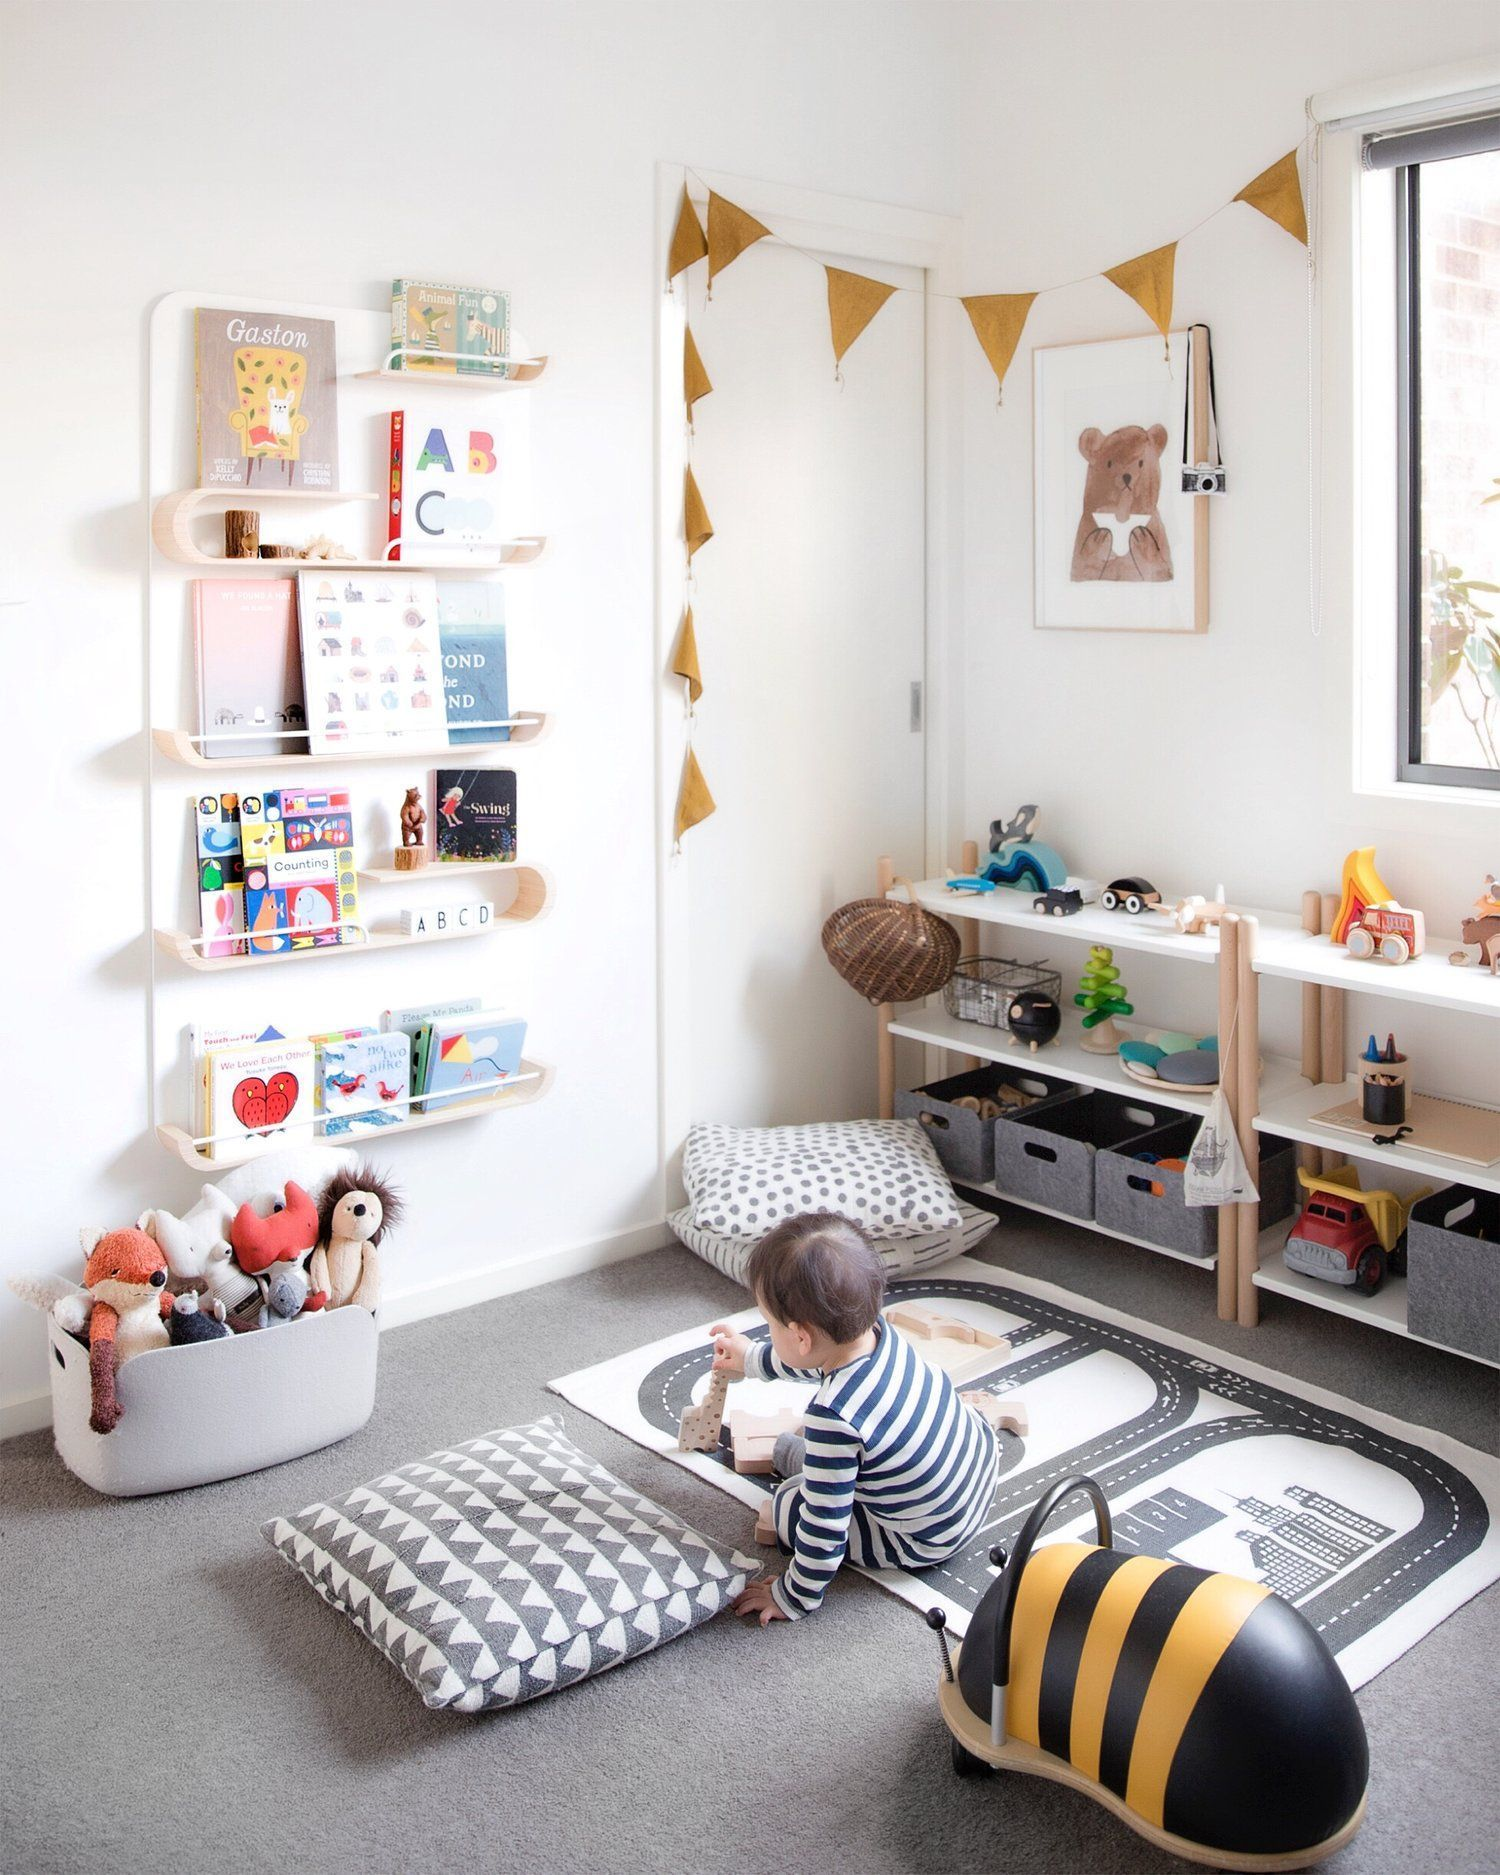 20 Latest Trend Of Cute Baby Boy Room Ideas #Decorideas